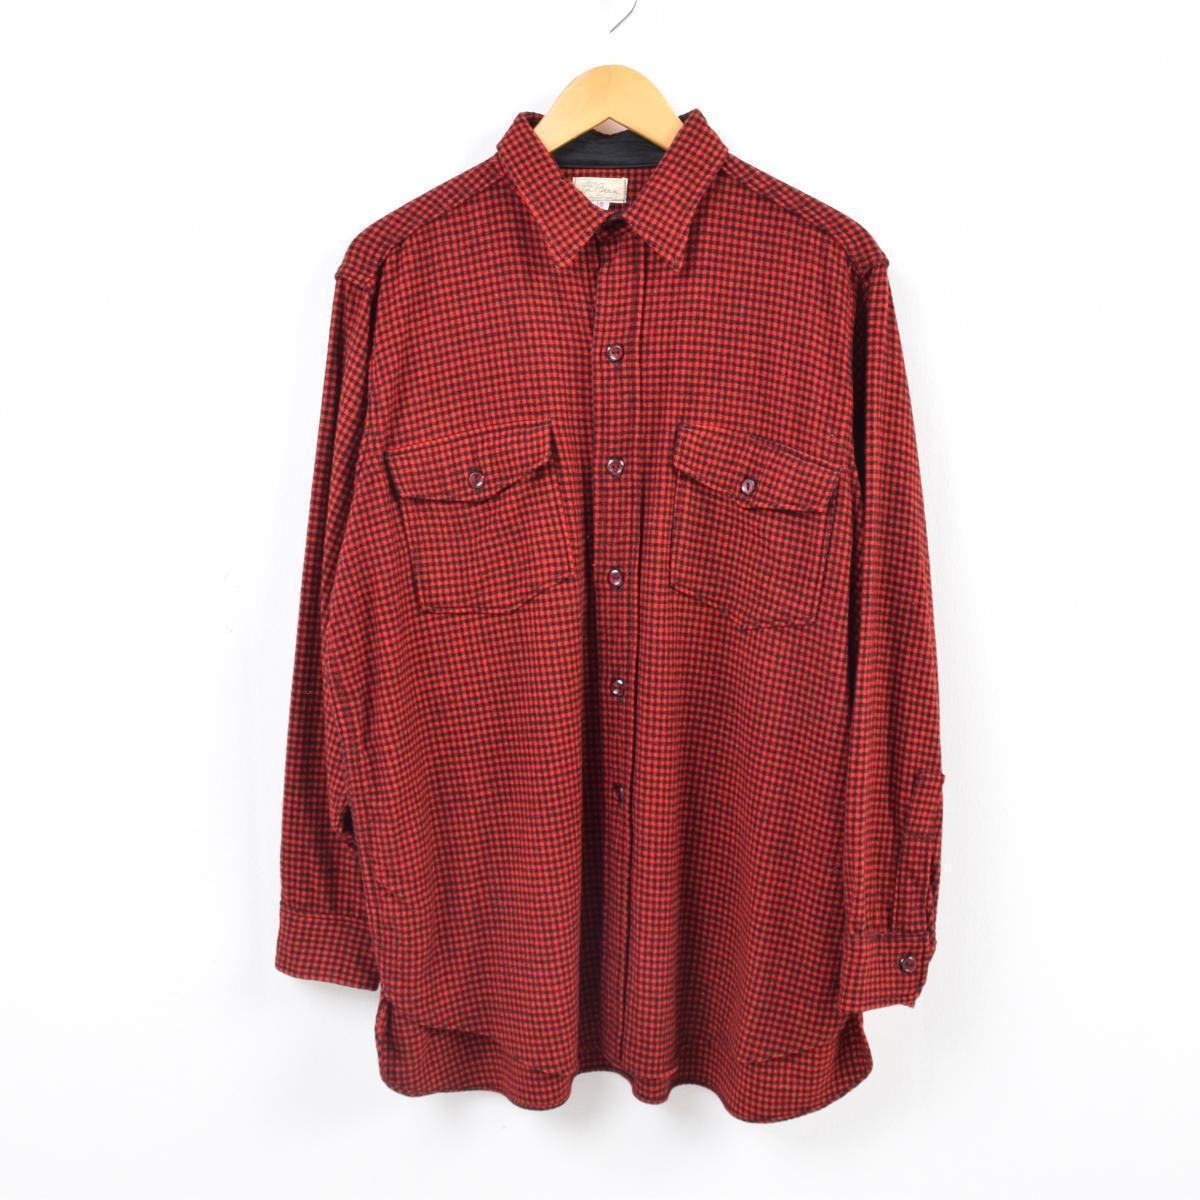 14170b3a32f59 VINTAGE CLOTHING JAM: 60s L. L. Bean L.L.Bean flowing script tag gingham  check wool shirt men M vintage /was7921 | Rakuten Global Market